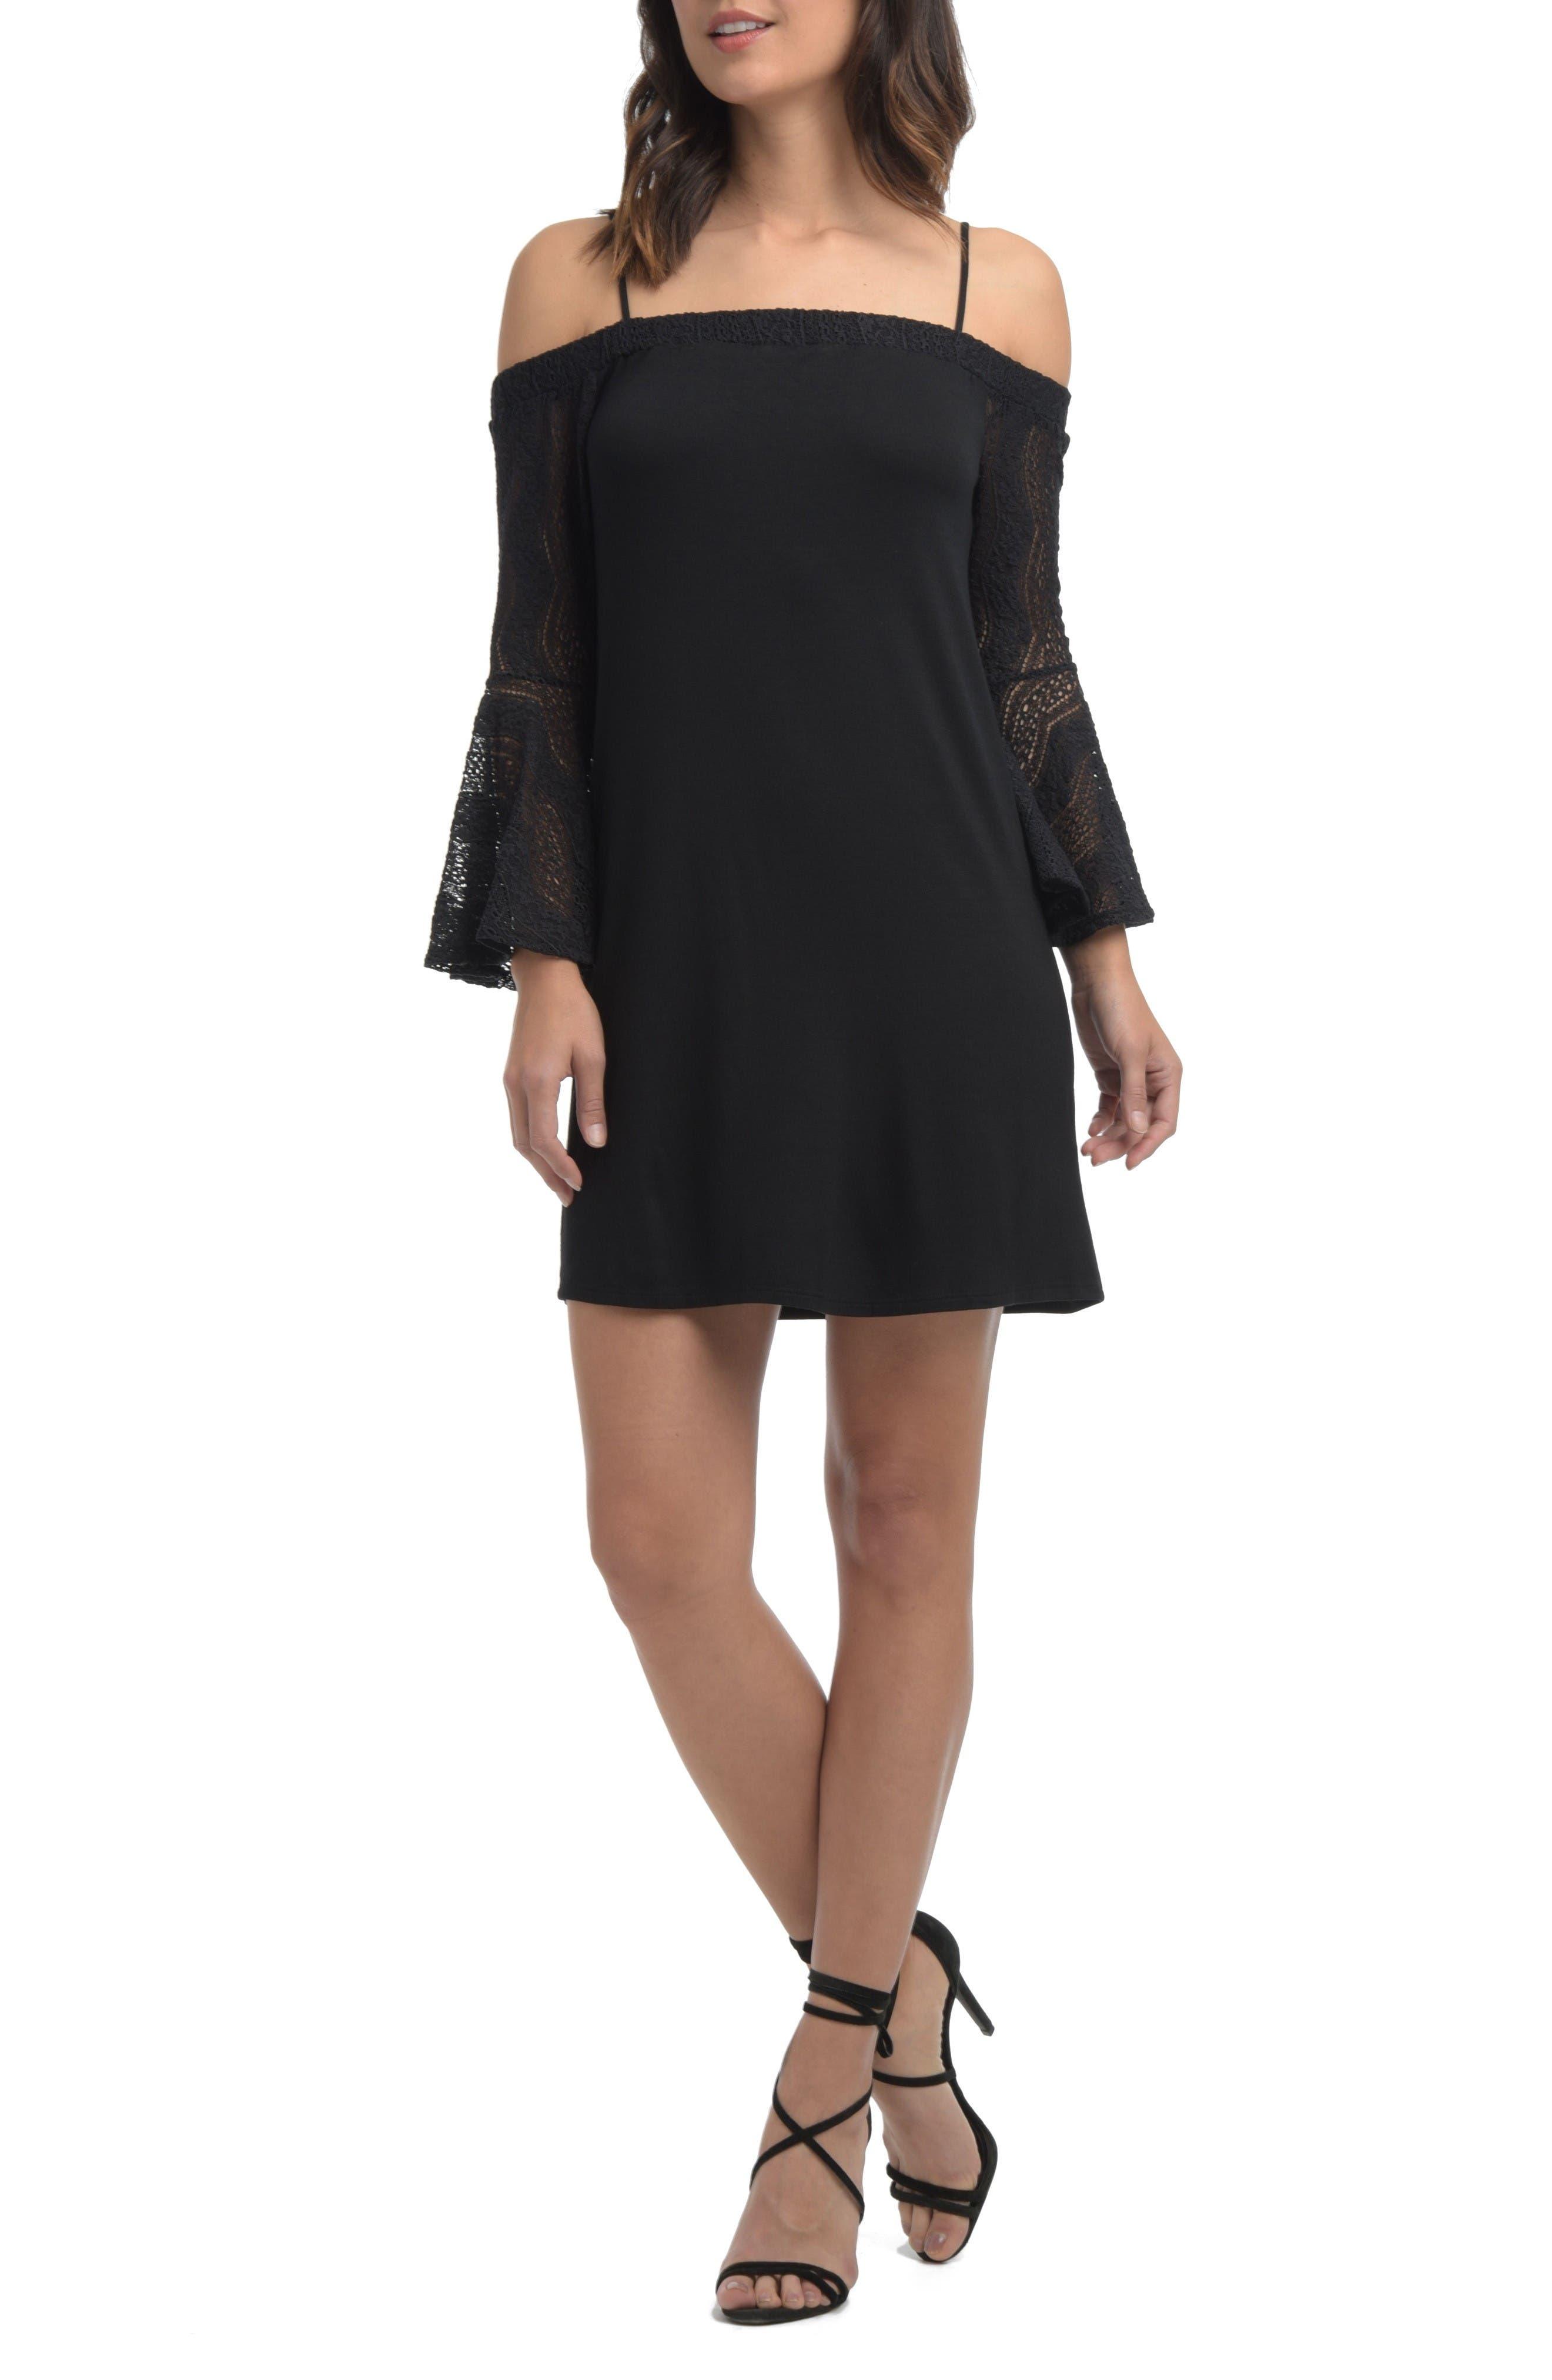 Alternate Image 1 Selected - Ella Moss Annalia Lace Cold Shoulder Dress